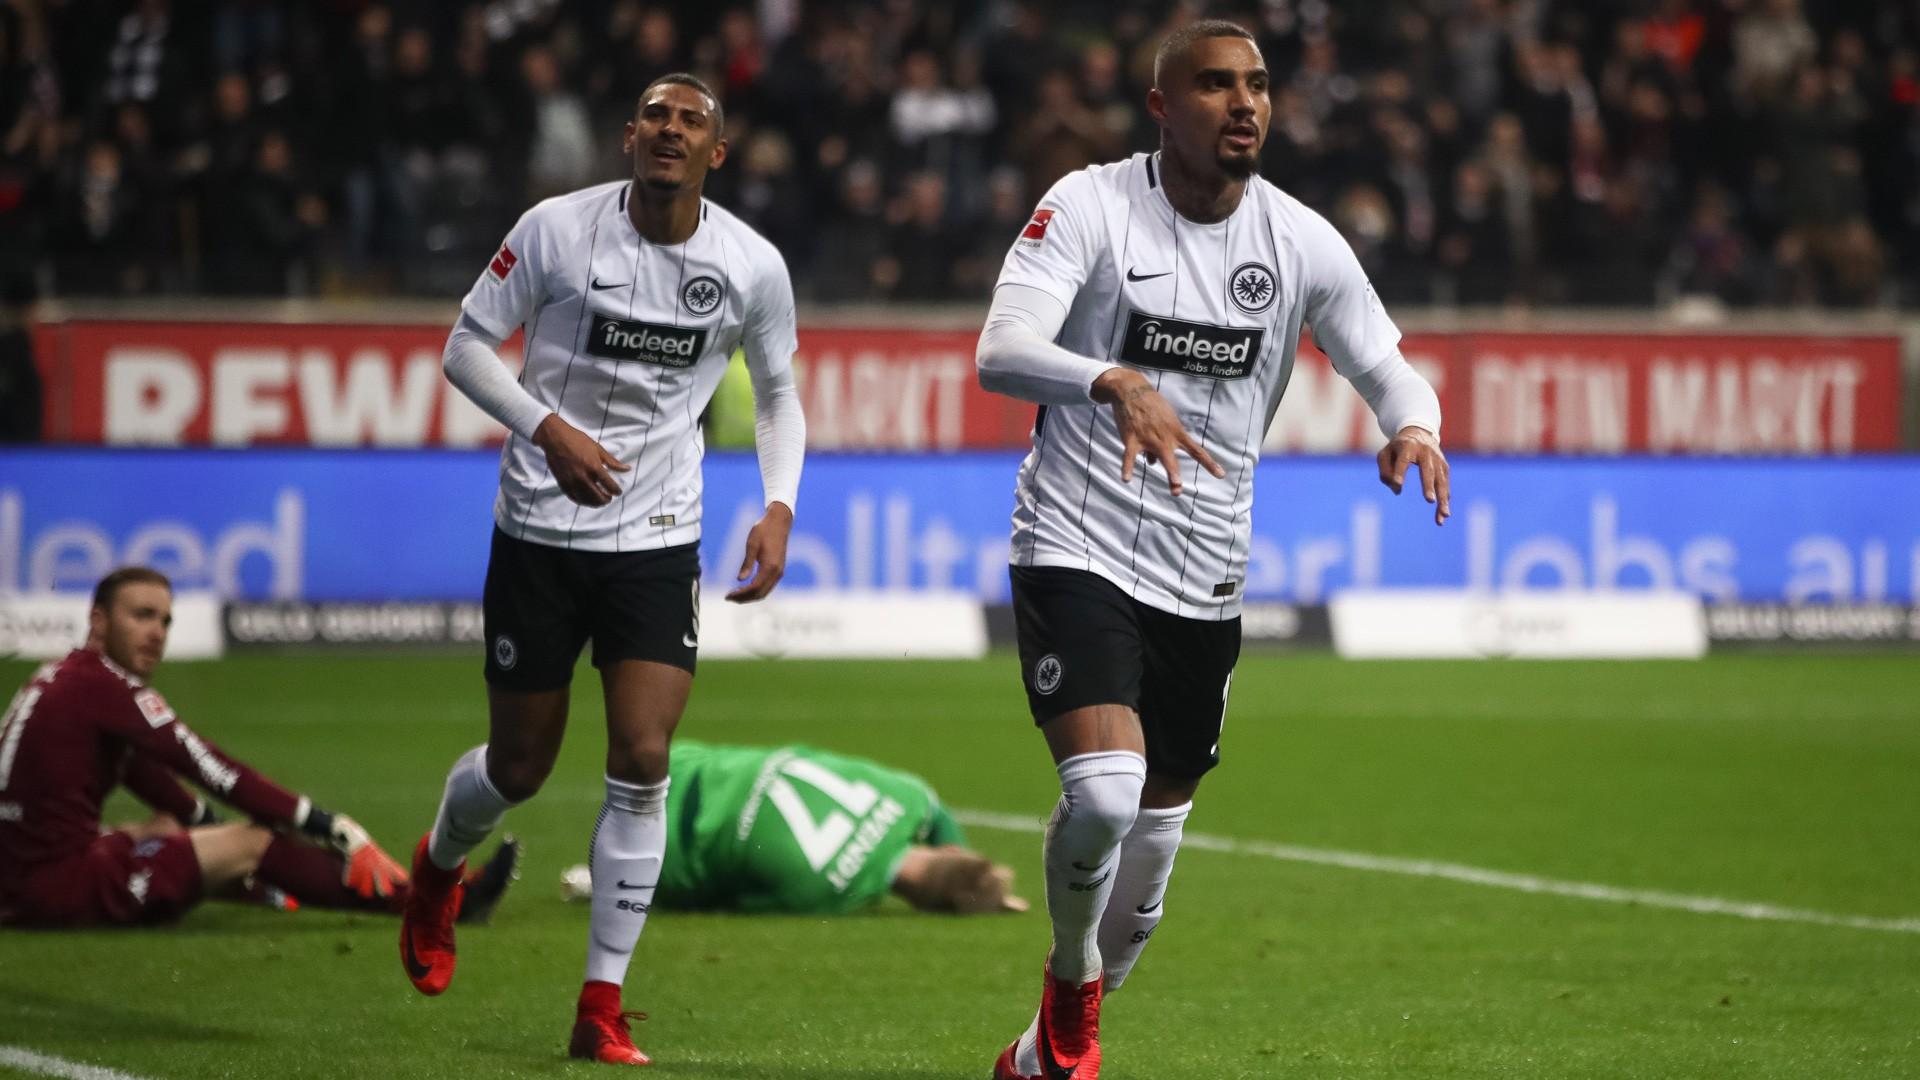 Video: Eintracht Frankfurt vs Borussia M gladbach